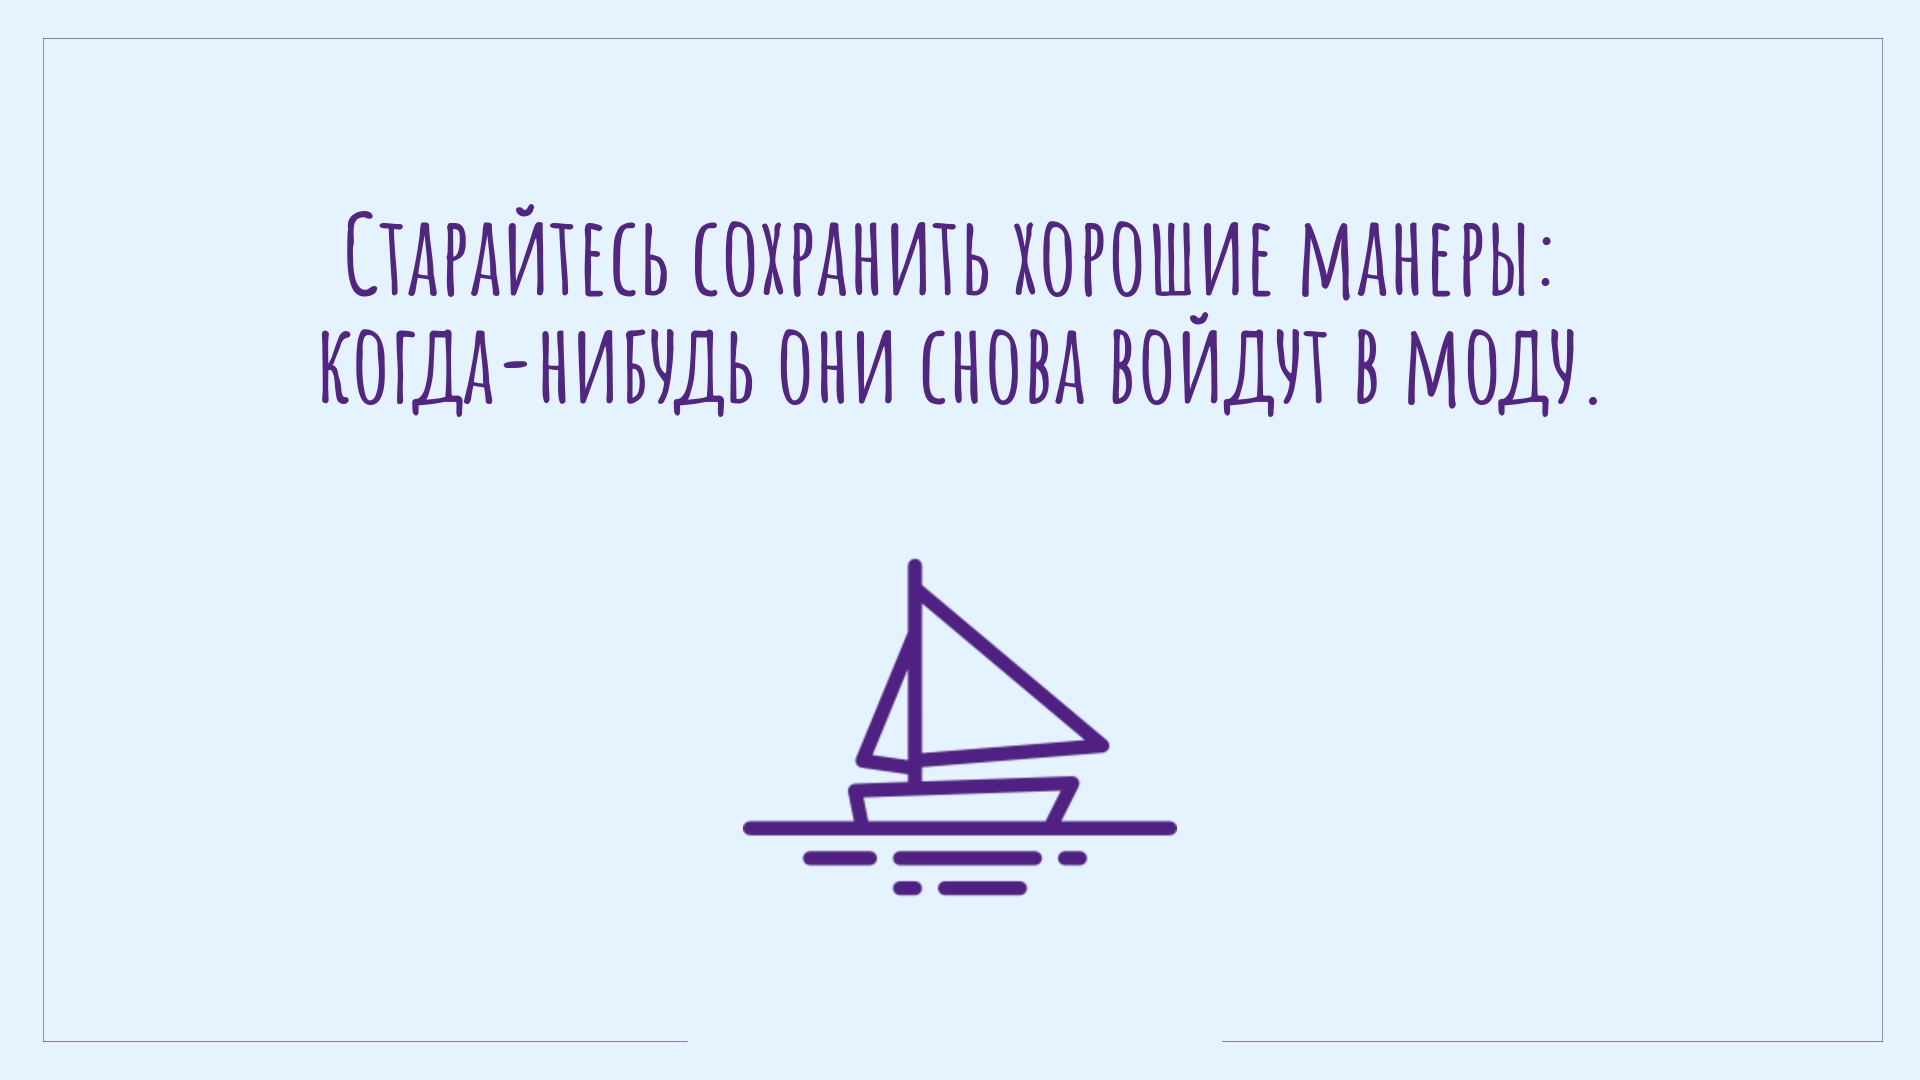 Хорошие манеры на яхте – Jazz Yachting